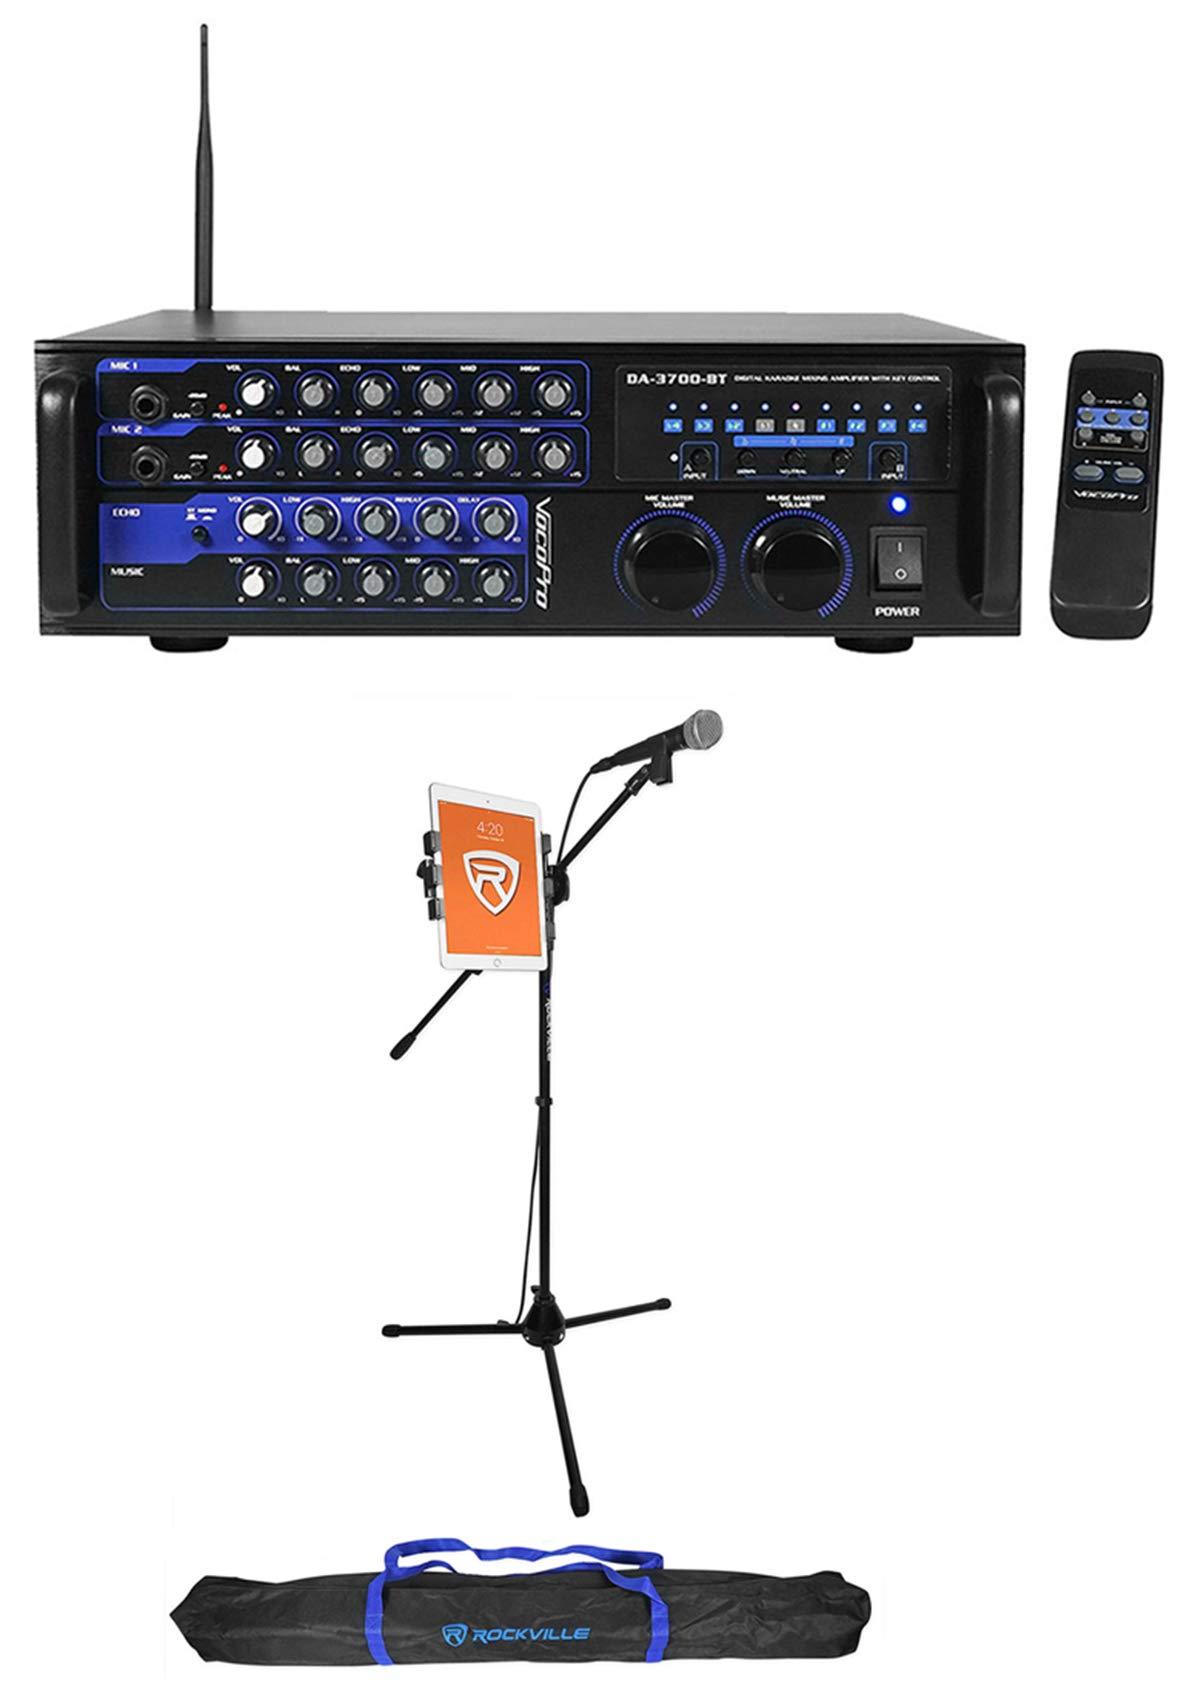 VOCOPRO DA-3700-BT 200w Digital Karaoke Mixer Amplifier w/Bluetooth+Mic+Stand